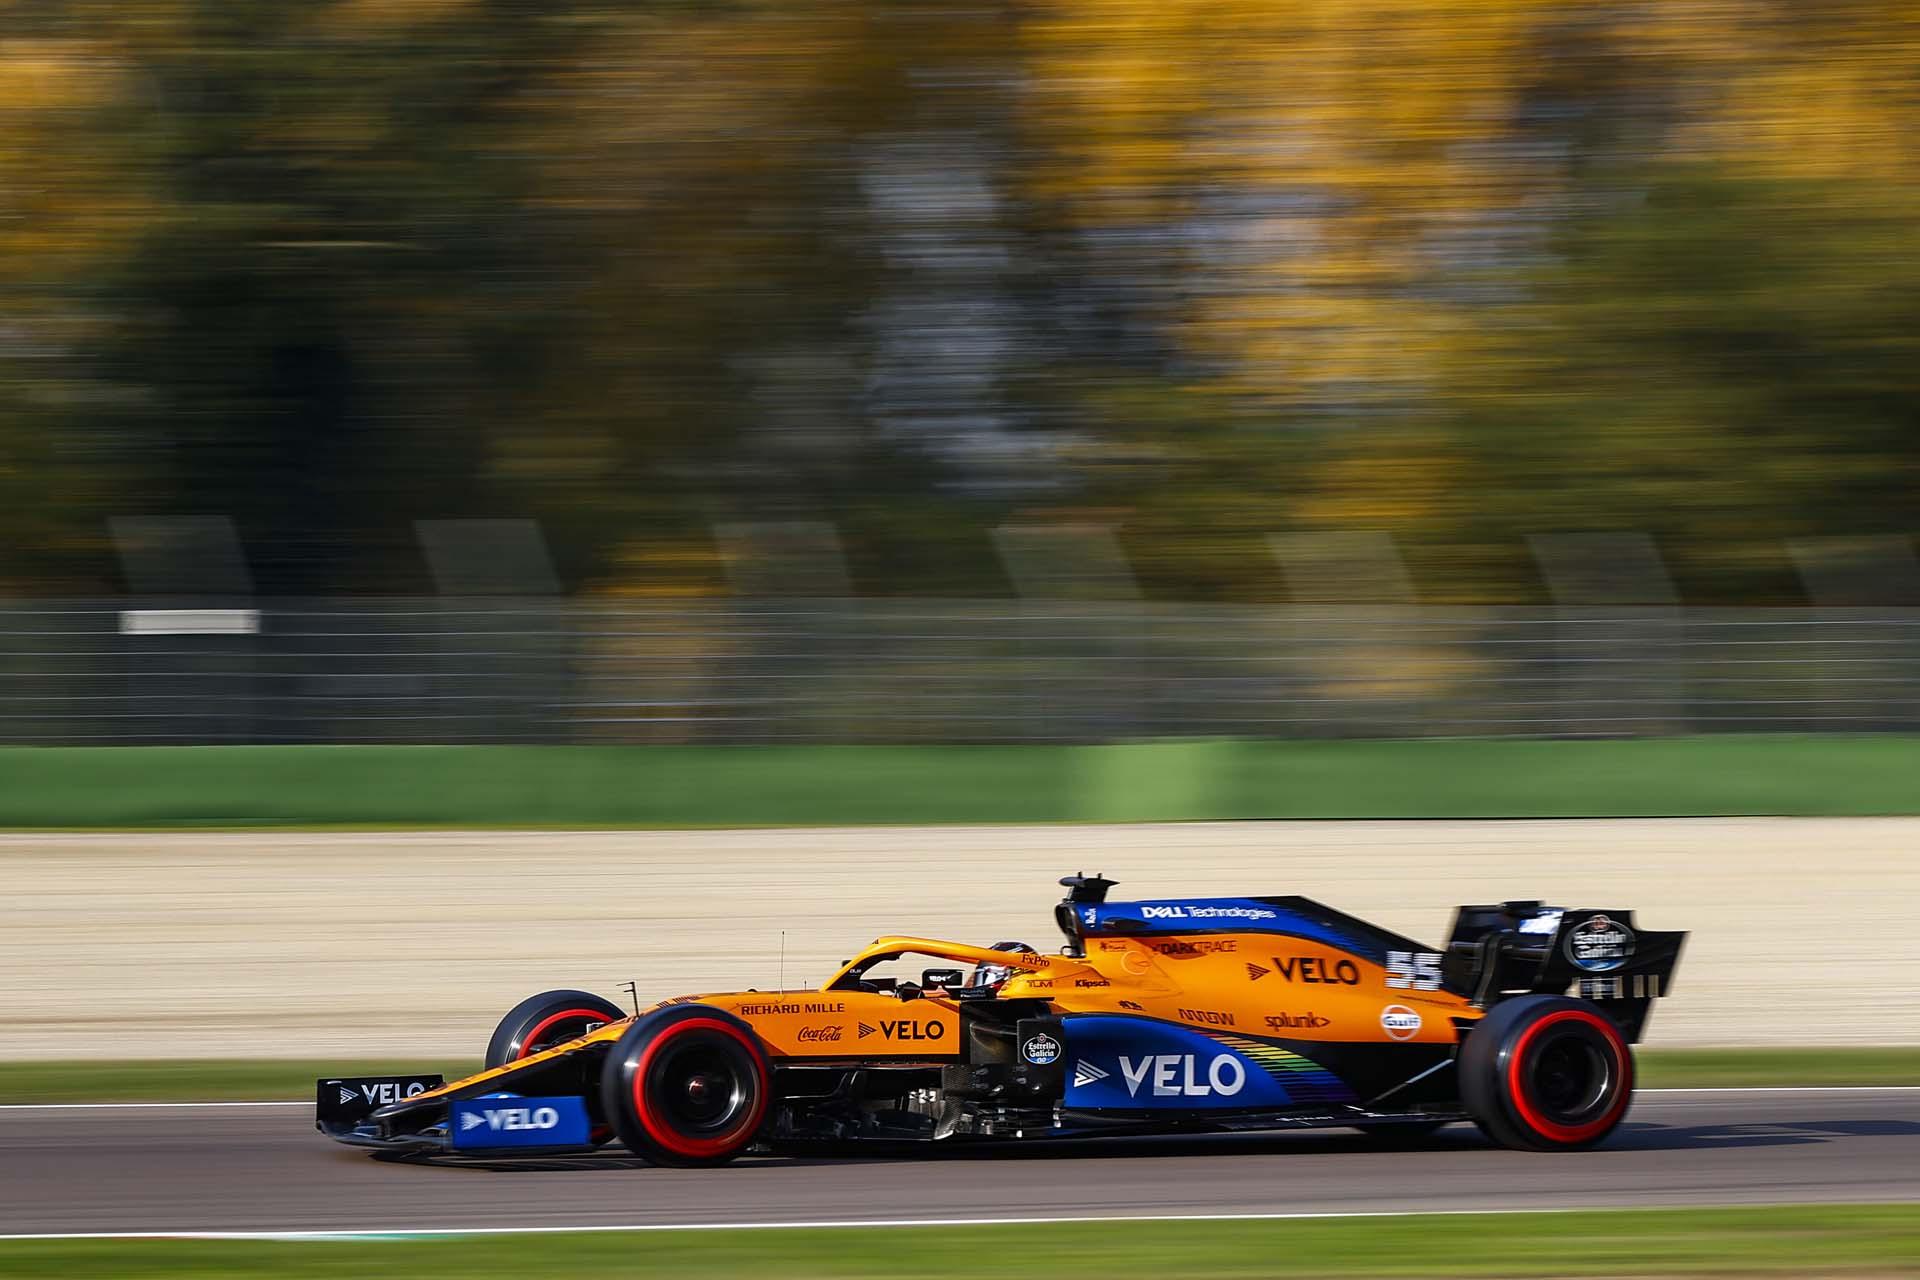 Carlos Sainz, McLaren MCL35, on a straight